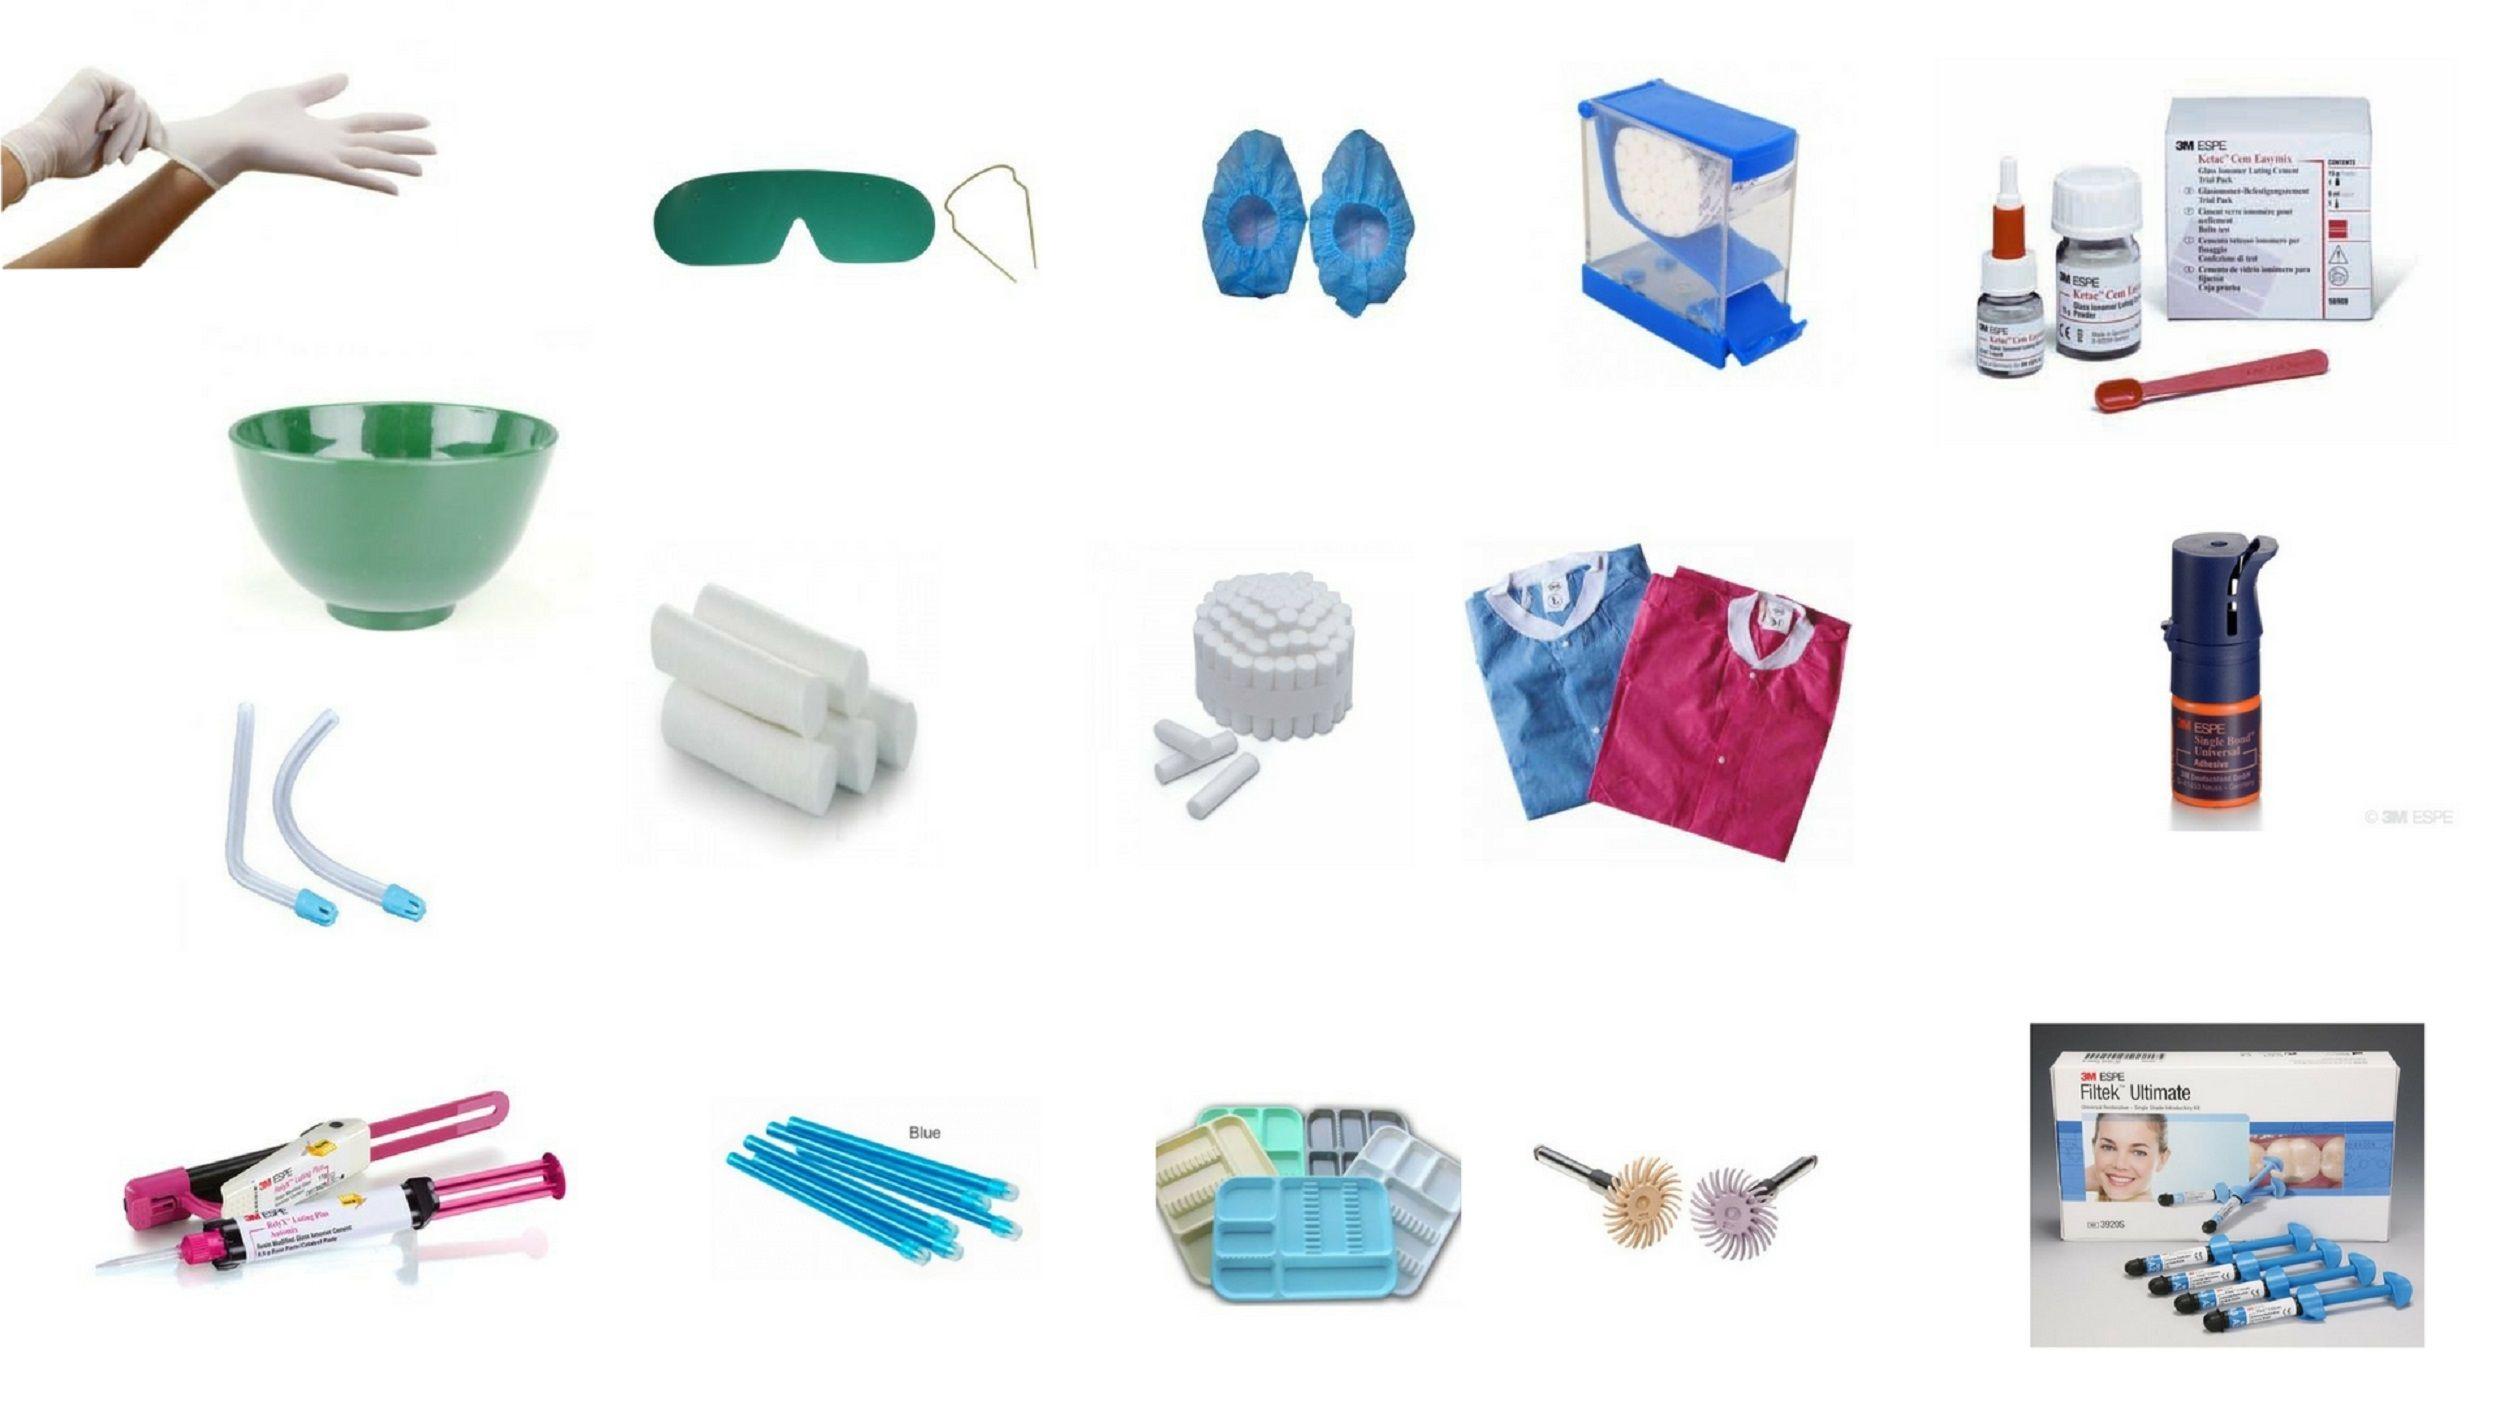 Dental Equipment Buy online at Indian Dental Mart | Dental